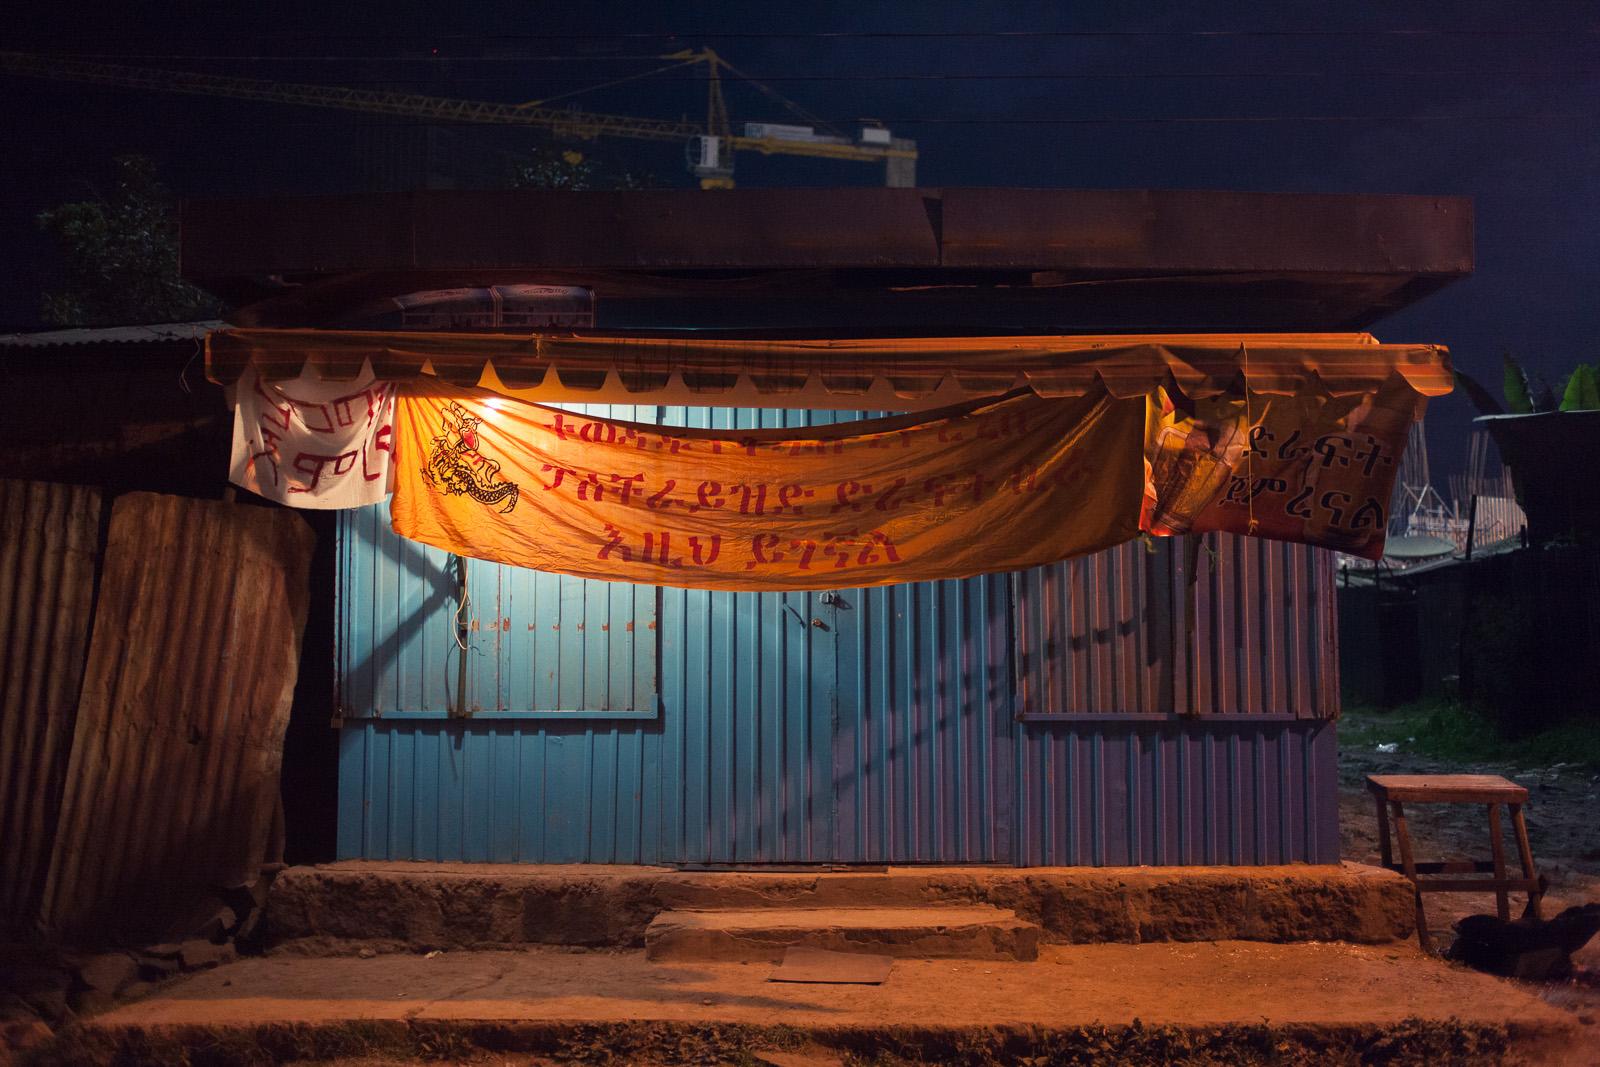 Tin Shack Bar, Addis Ababa, Ethiopia